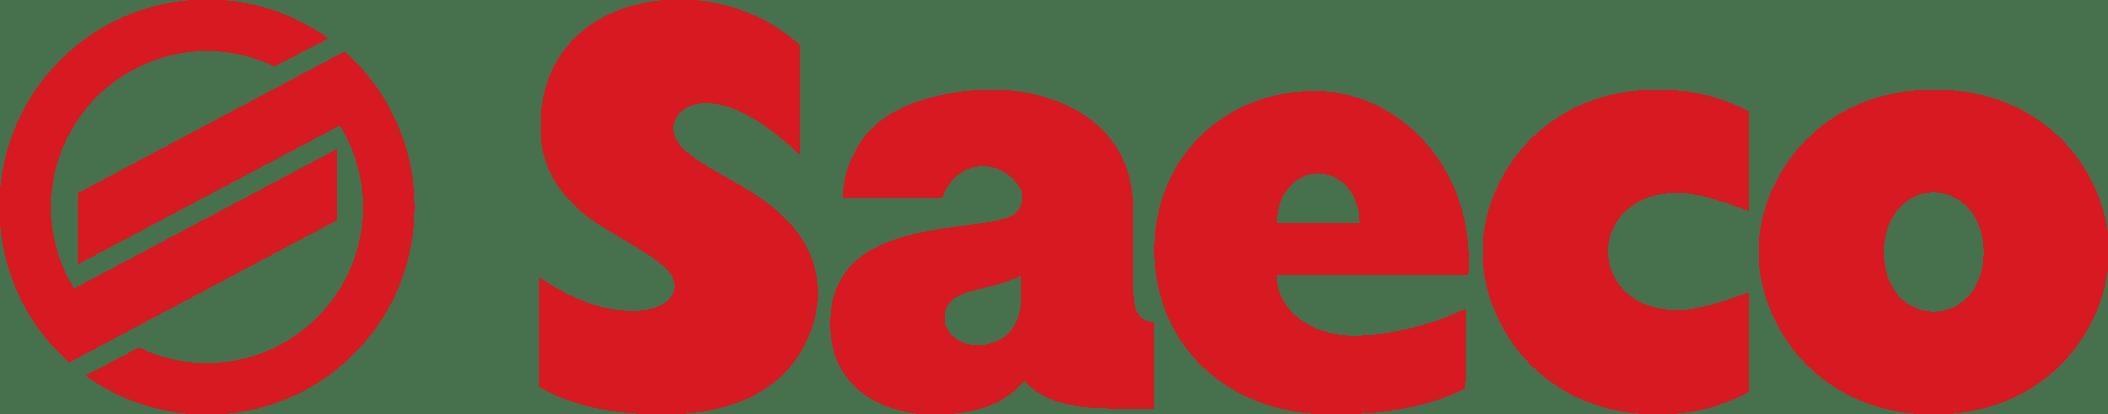 Saeco Logo png